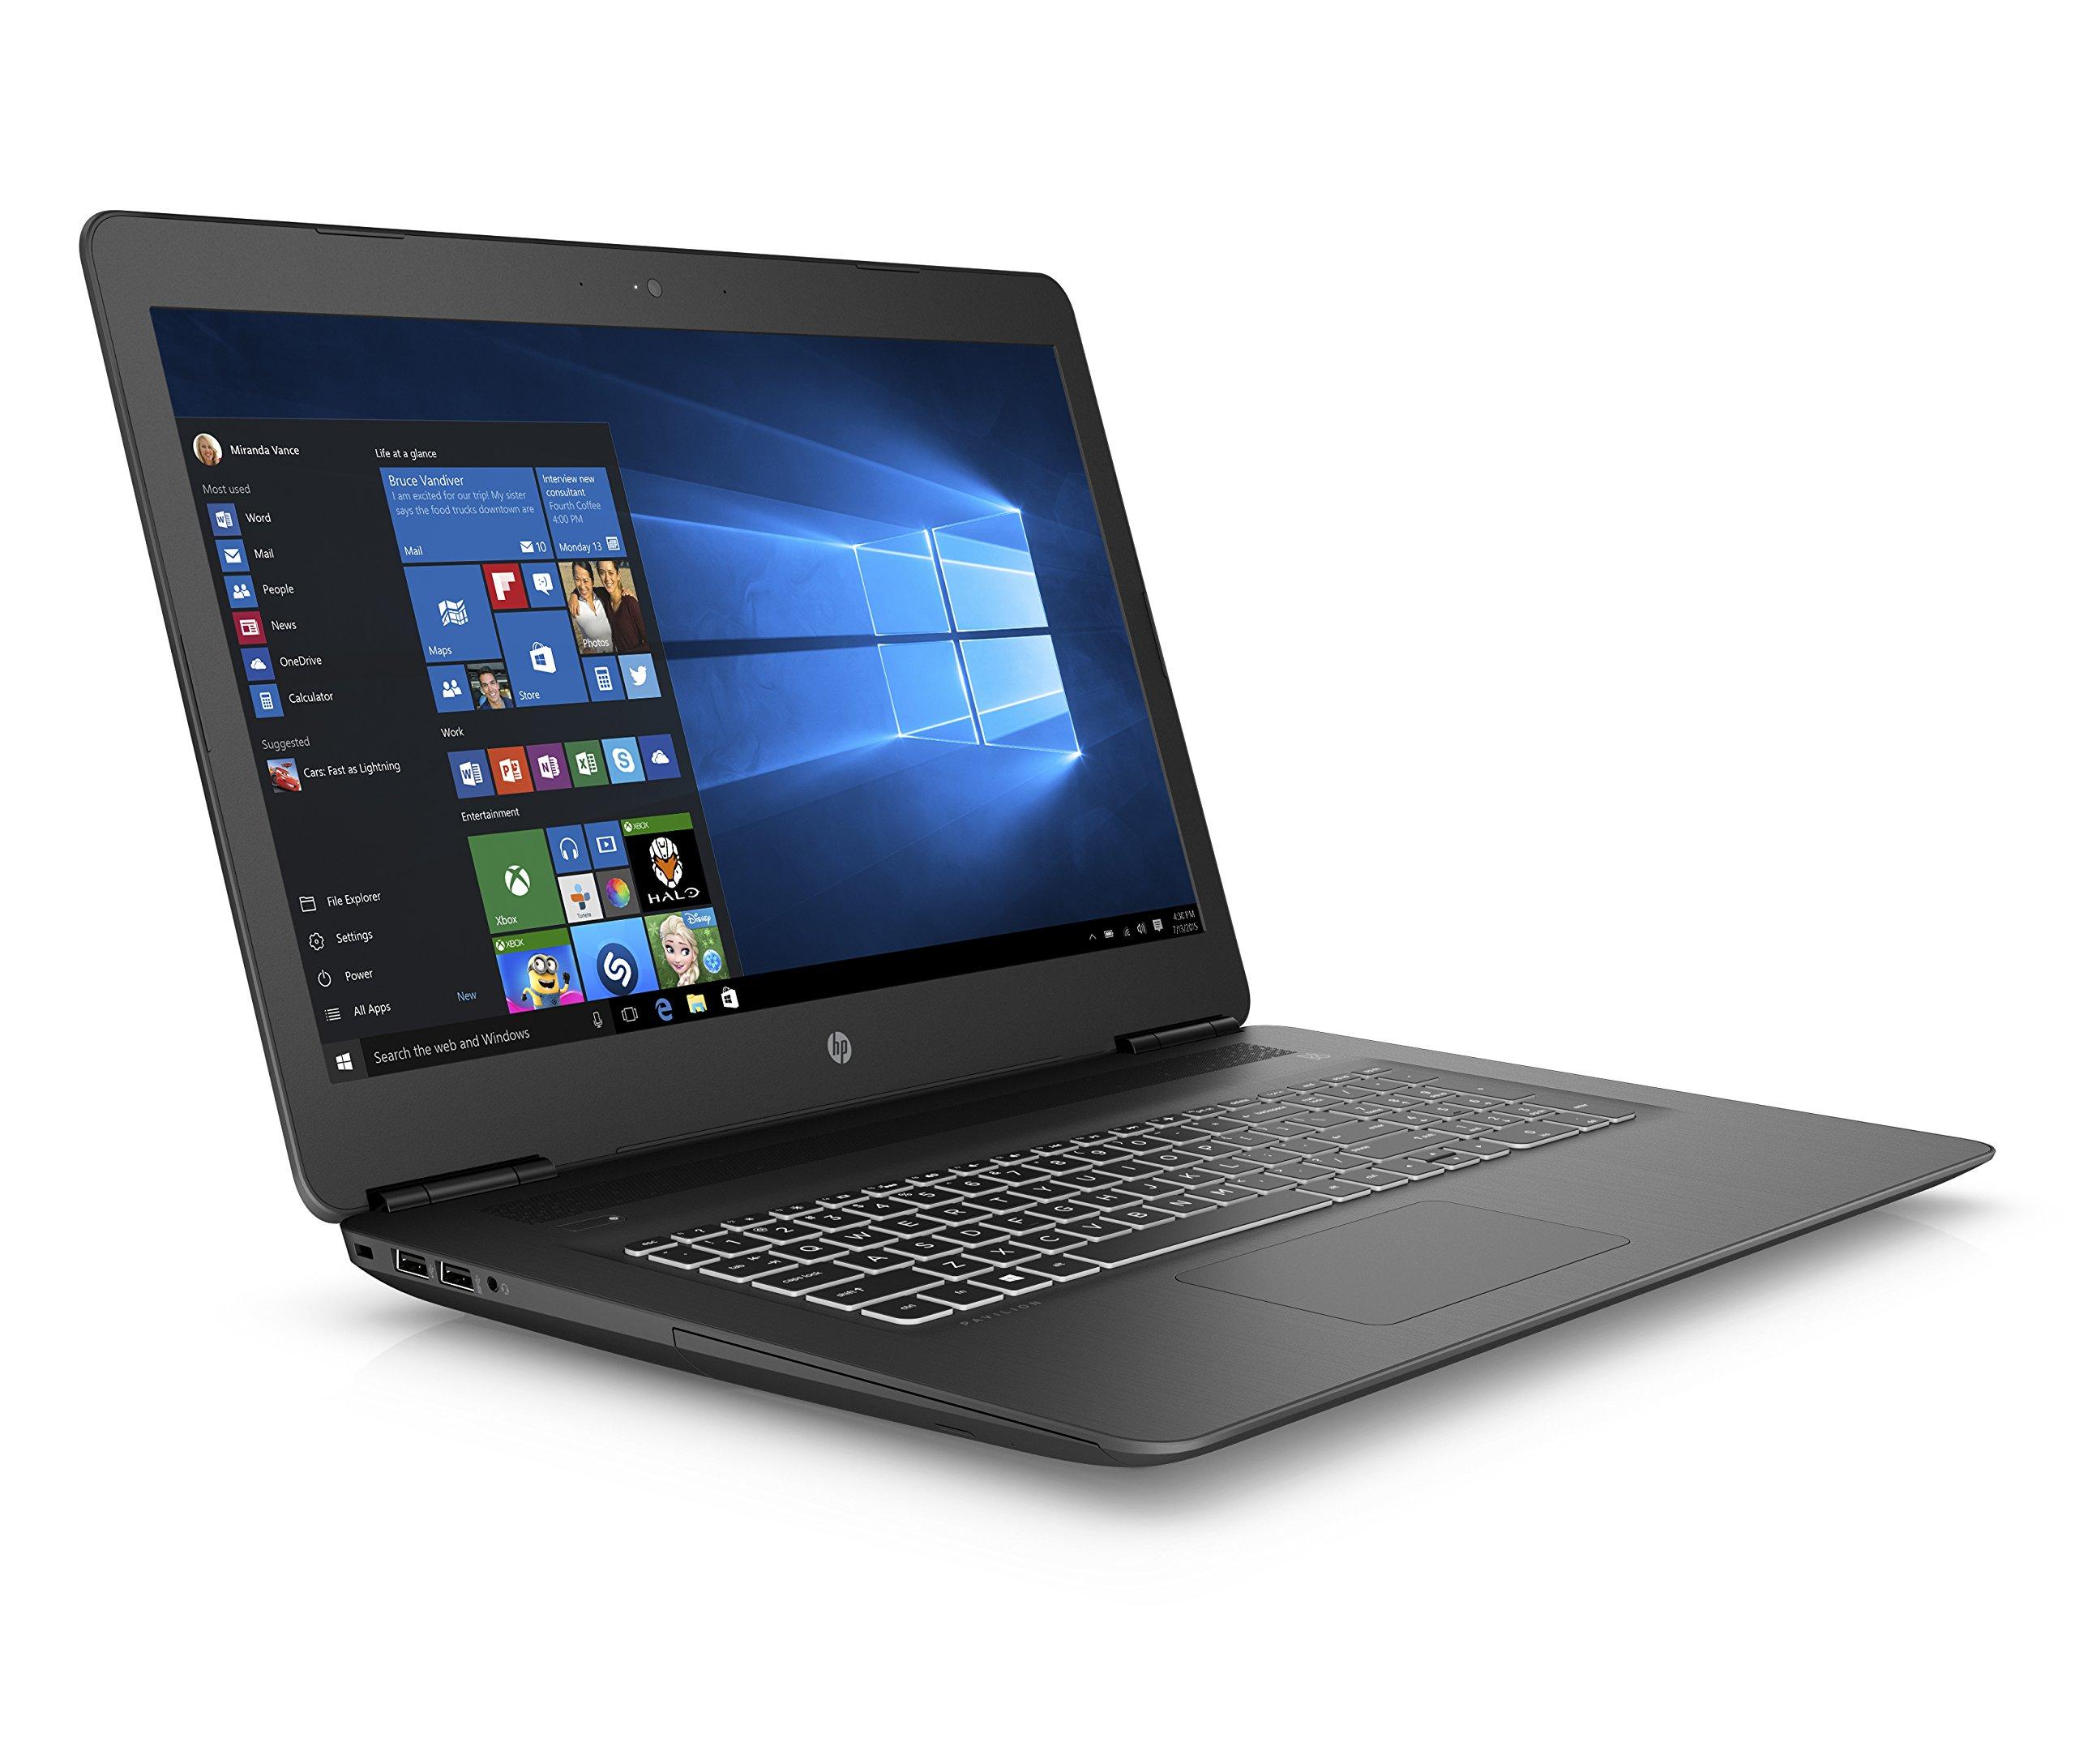 HP Pavilion 17-ab405na 17.3 Inch FHD Gaming Laptop – (Black) (Intel i5-8300H, 8 GB RAM, 1 TB HDD, NVIDIA GeForce GTX…